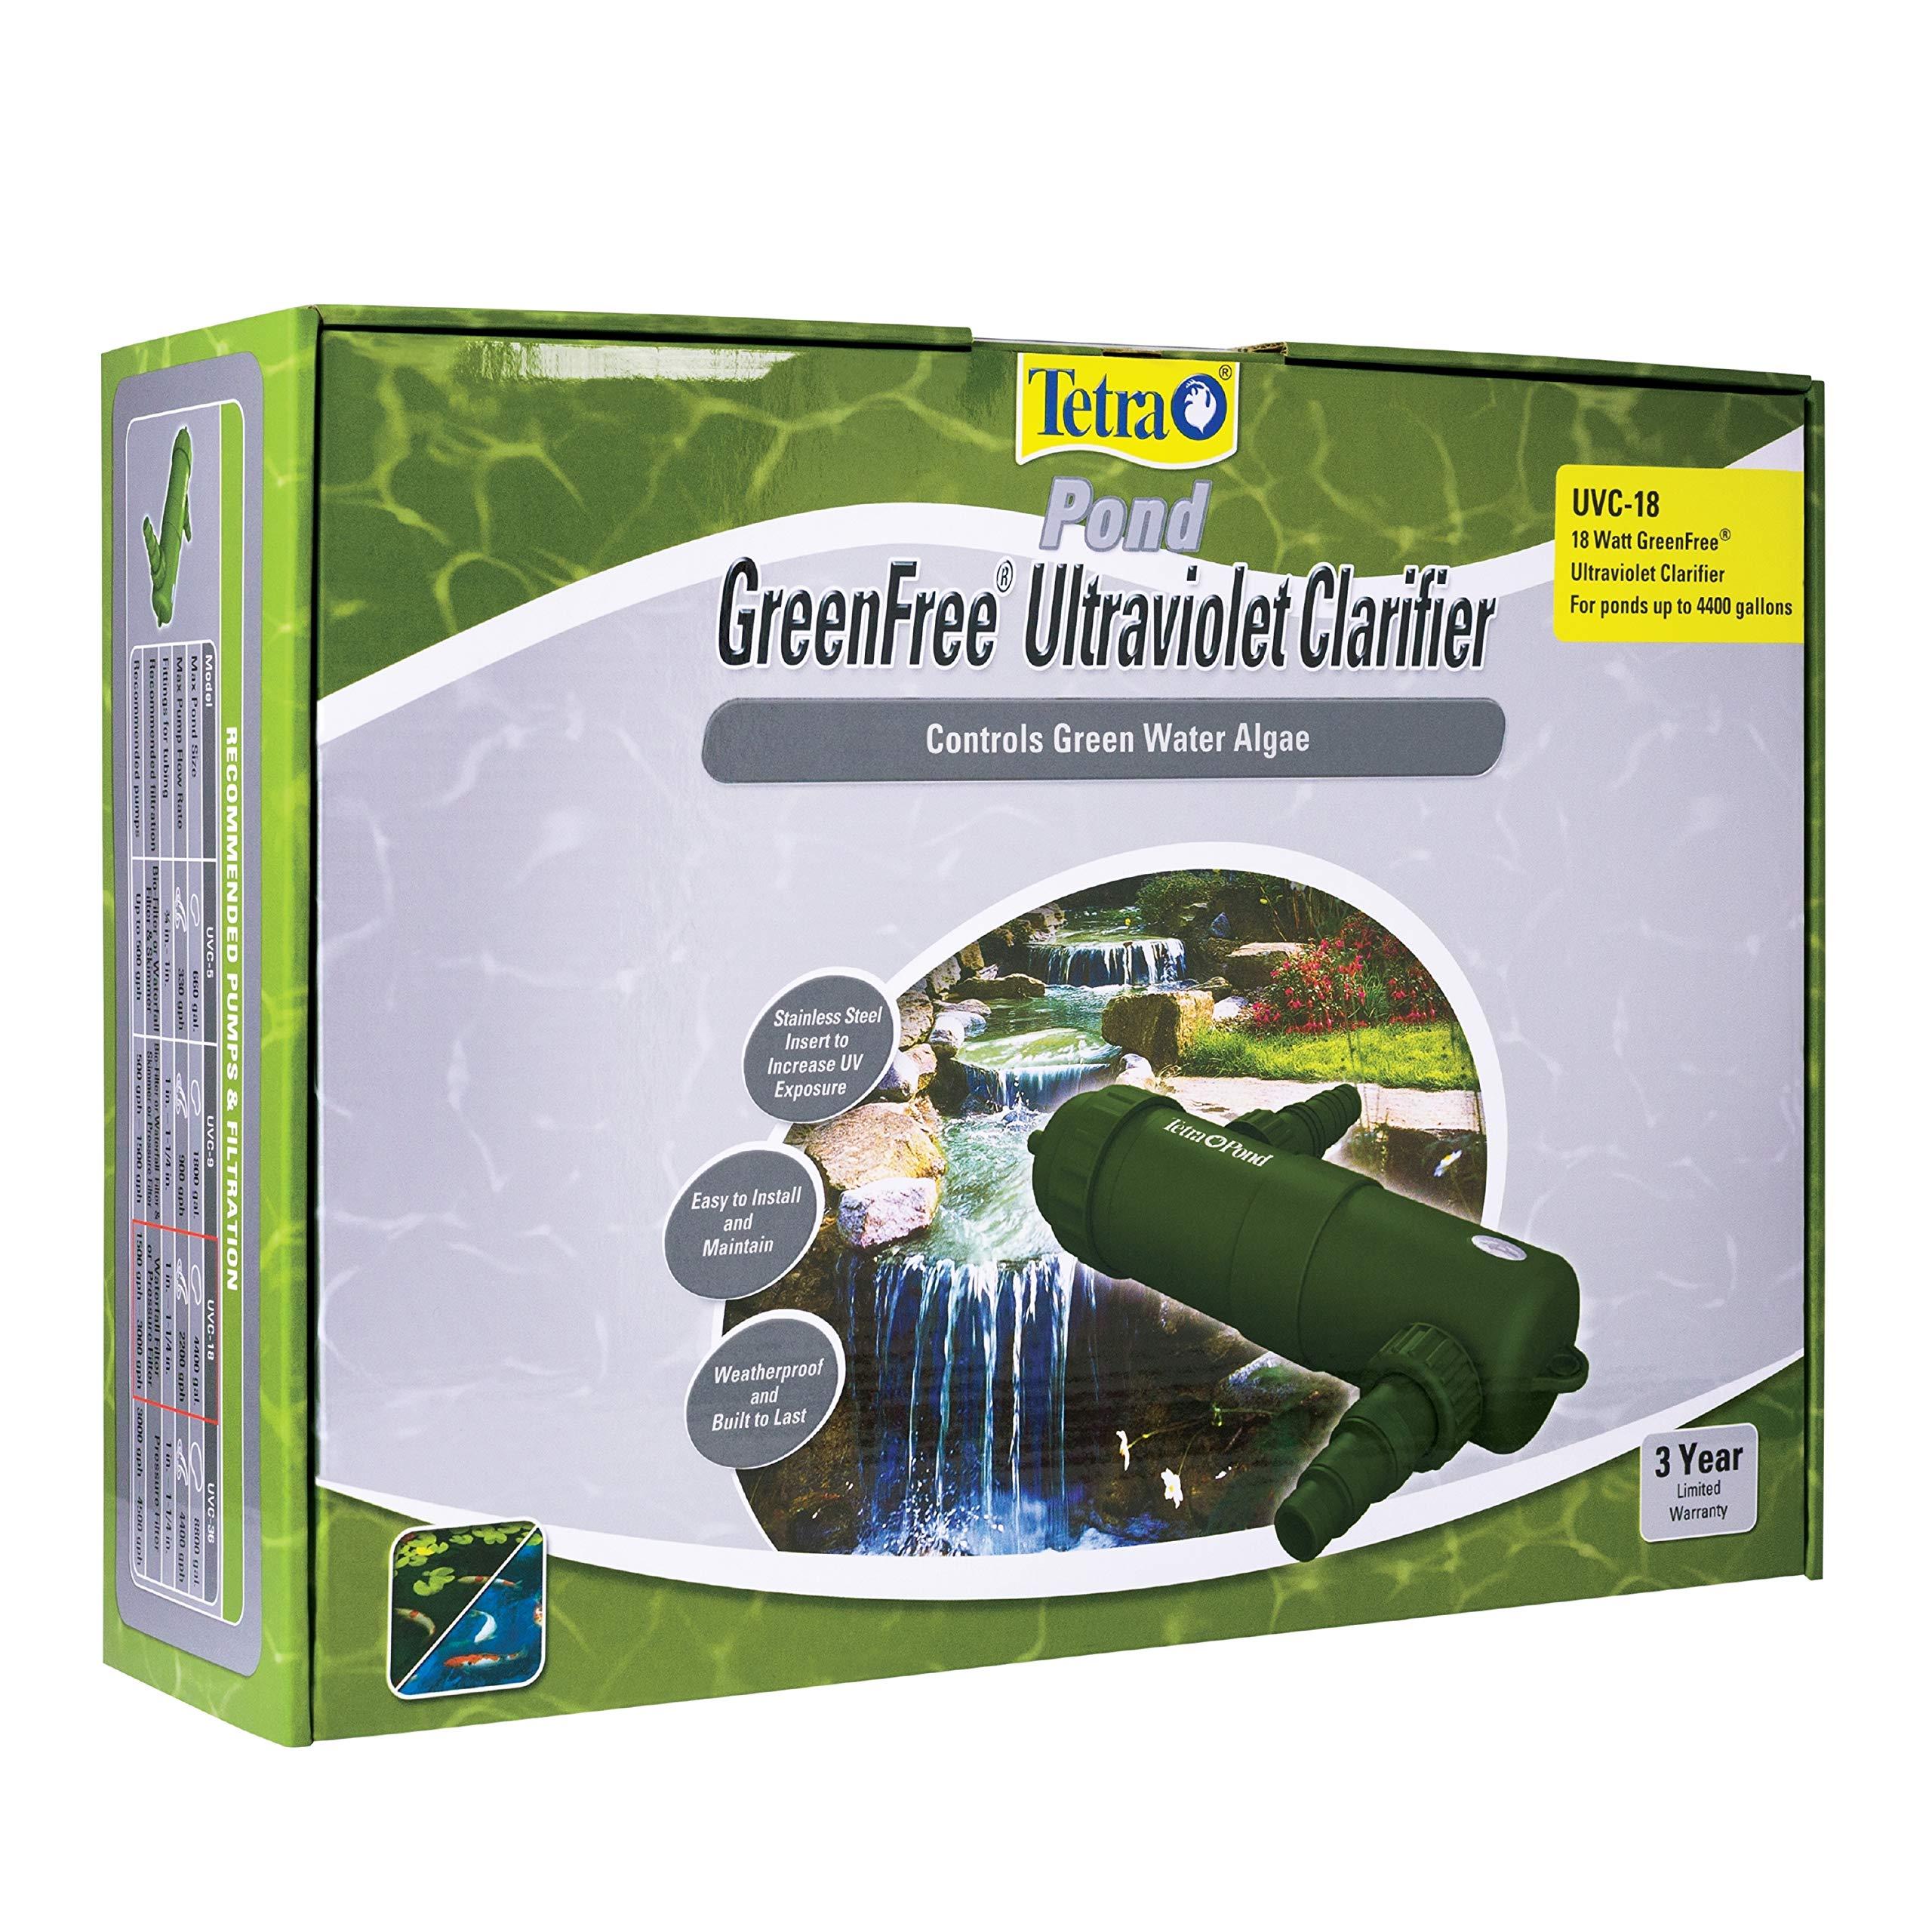 TetraPond UVC-18 GreenFree UV Clarifiers, Up To 4400 Gallons, 18-Watt